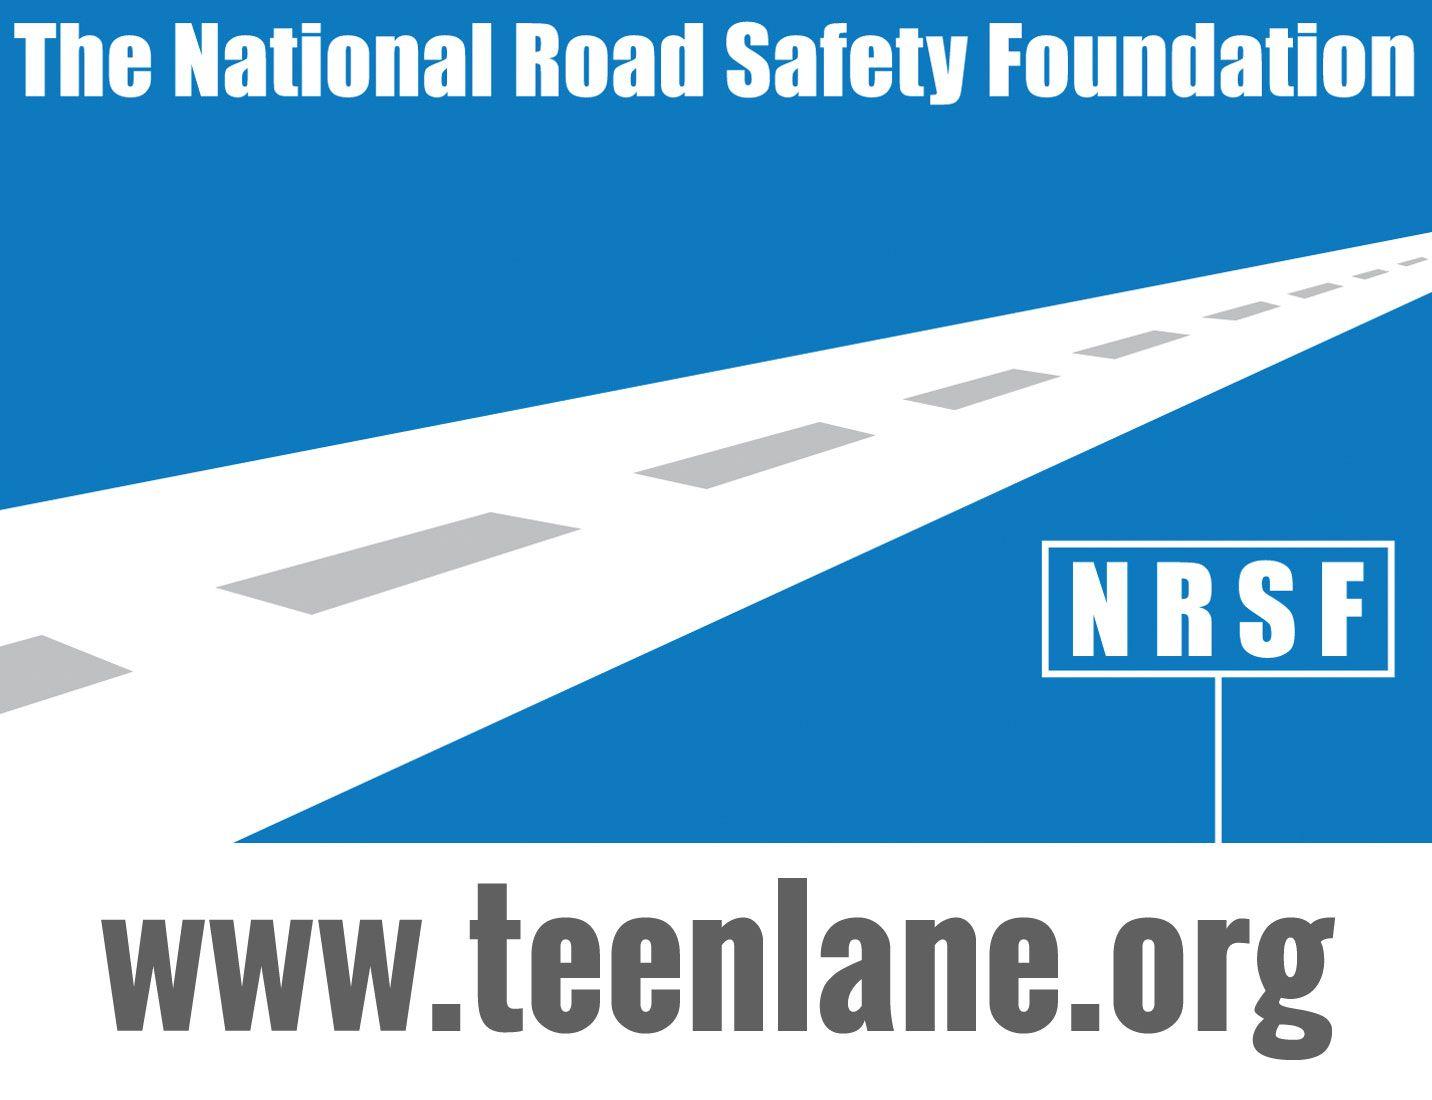 Promote Safe Driving A Creative Psa Project Scholastic